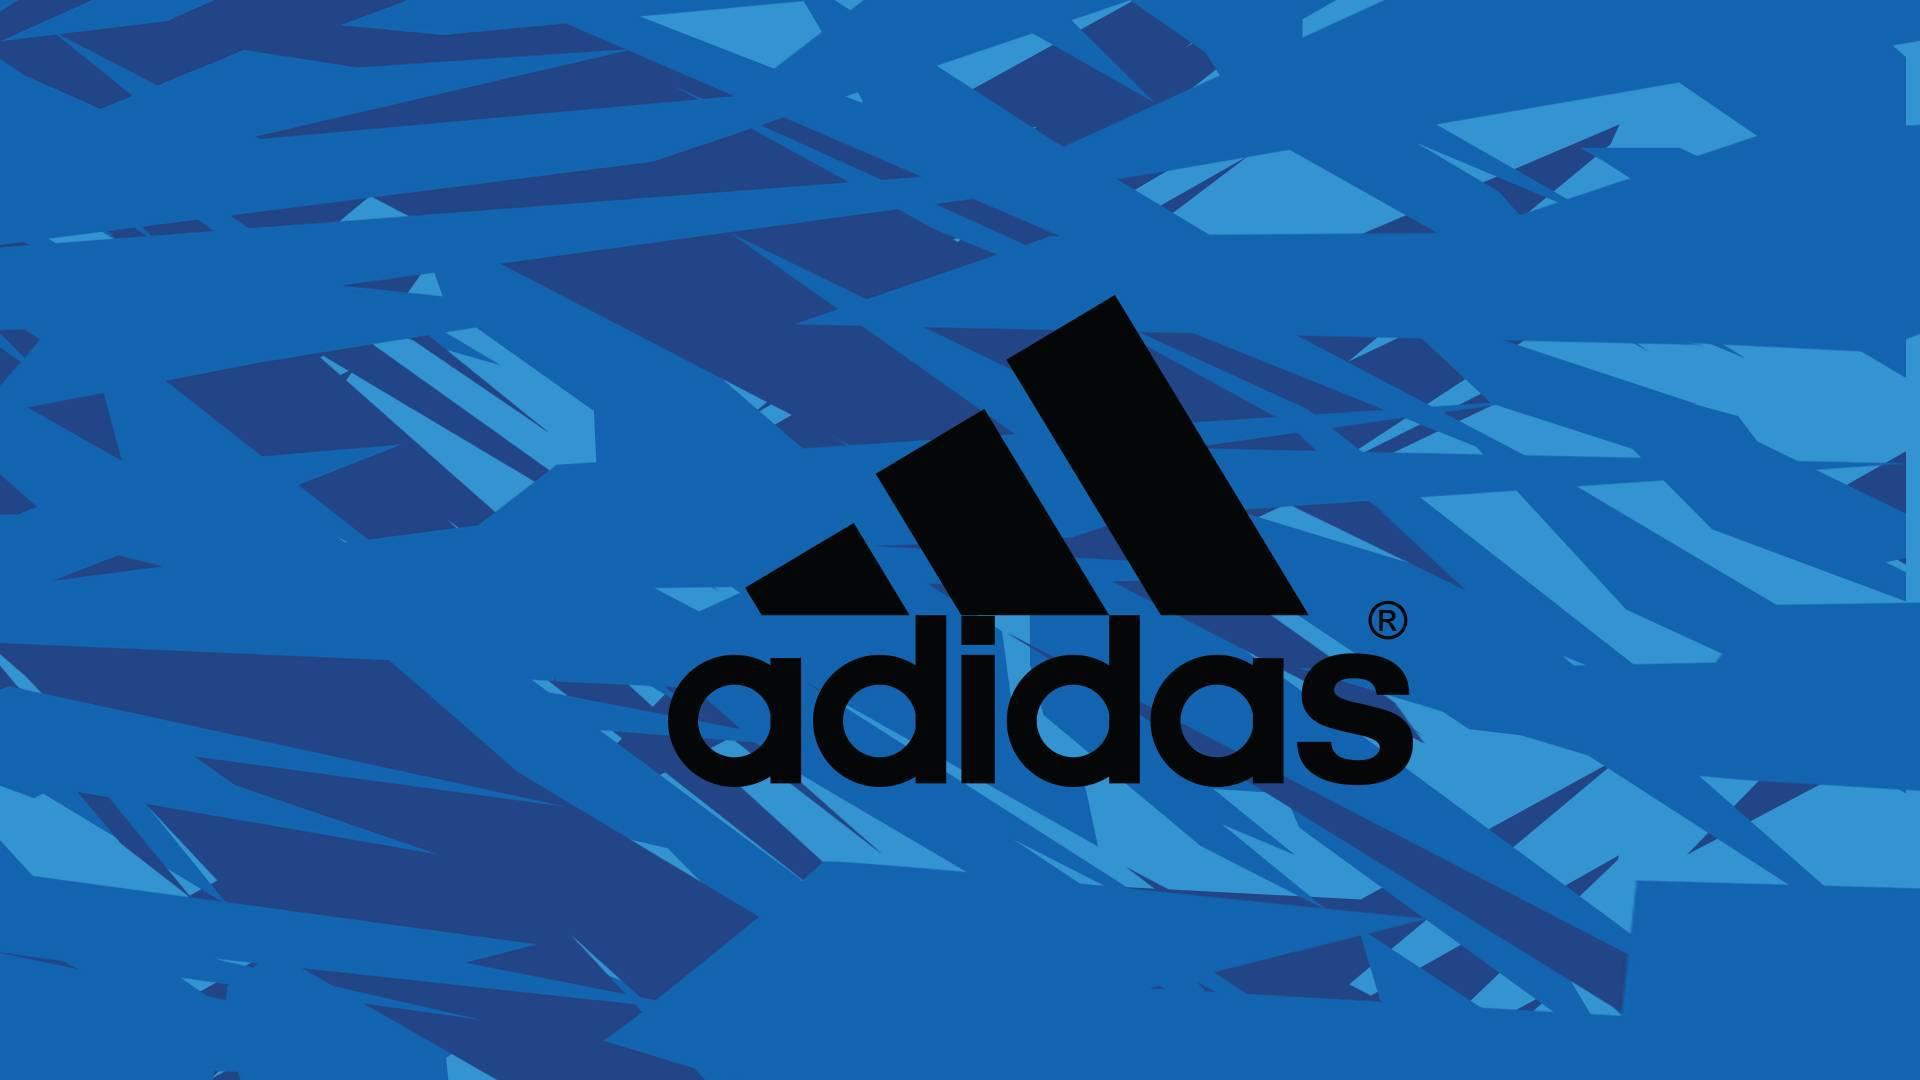 Cute adidas wallpaper pinteres 1920x1080 voltagebd Image collections